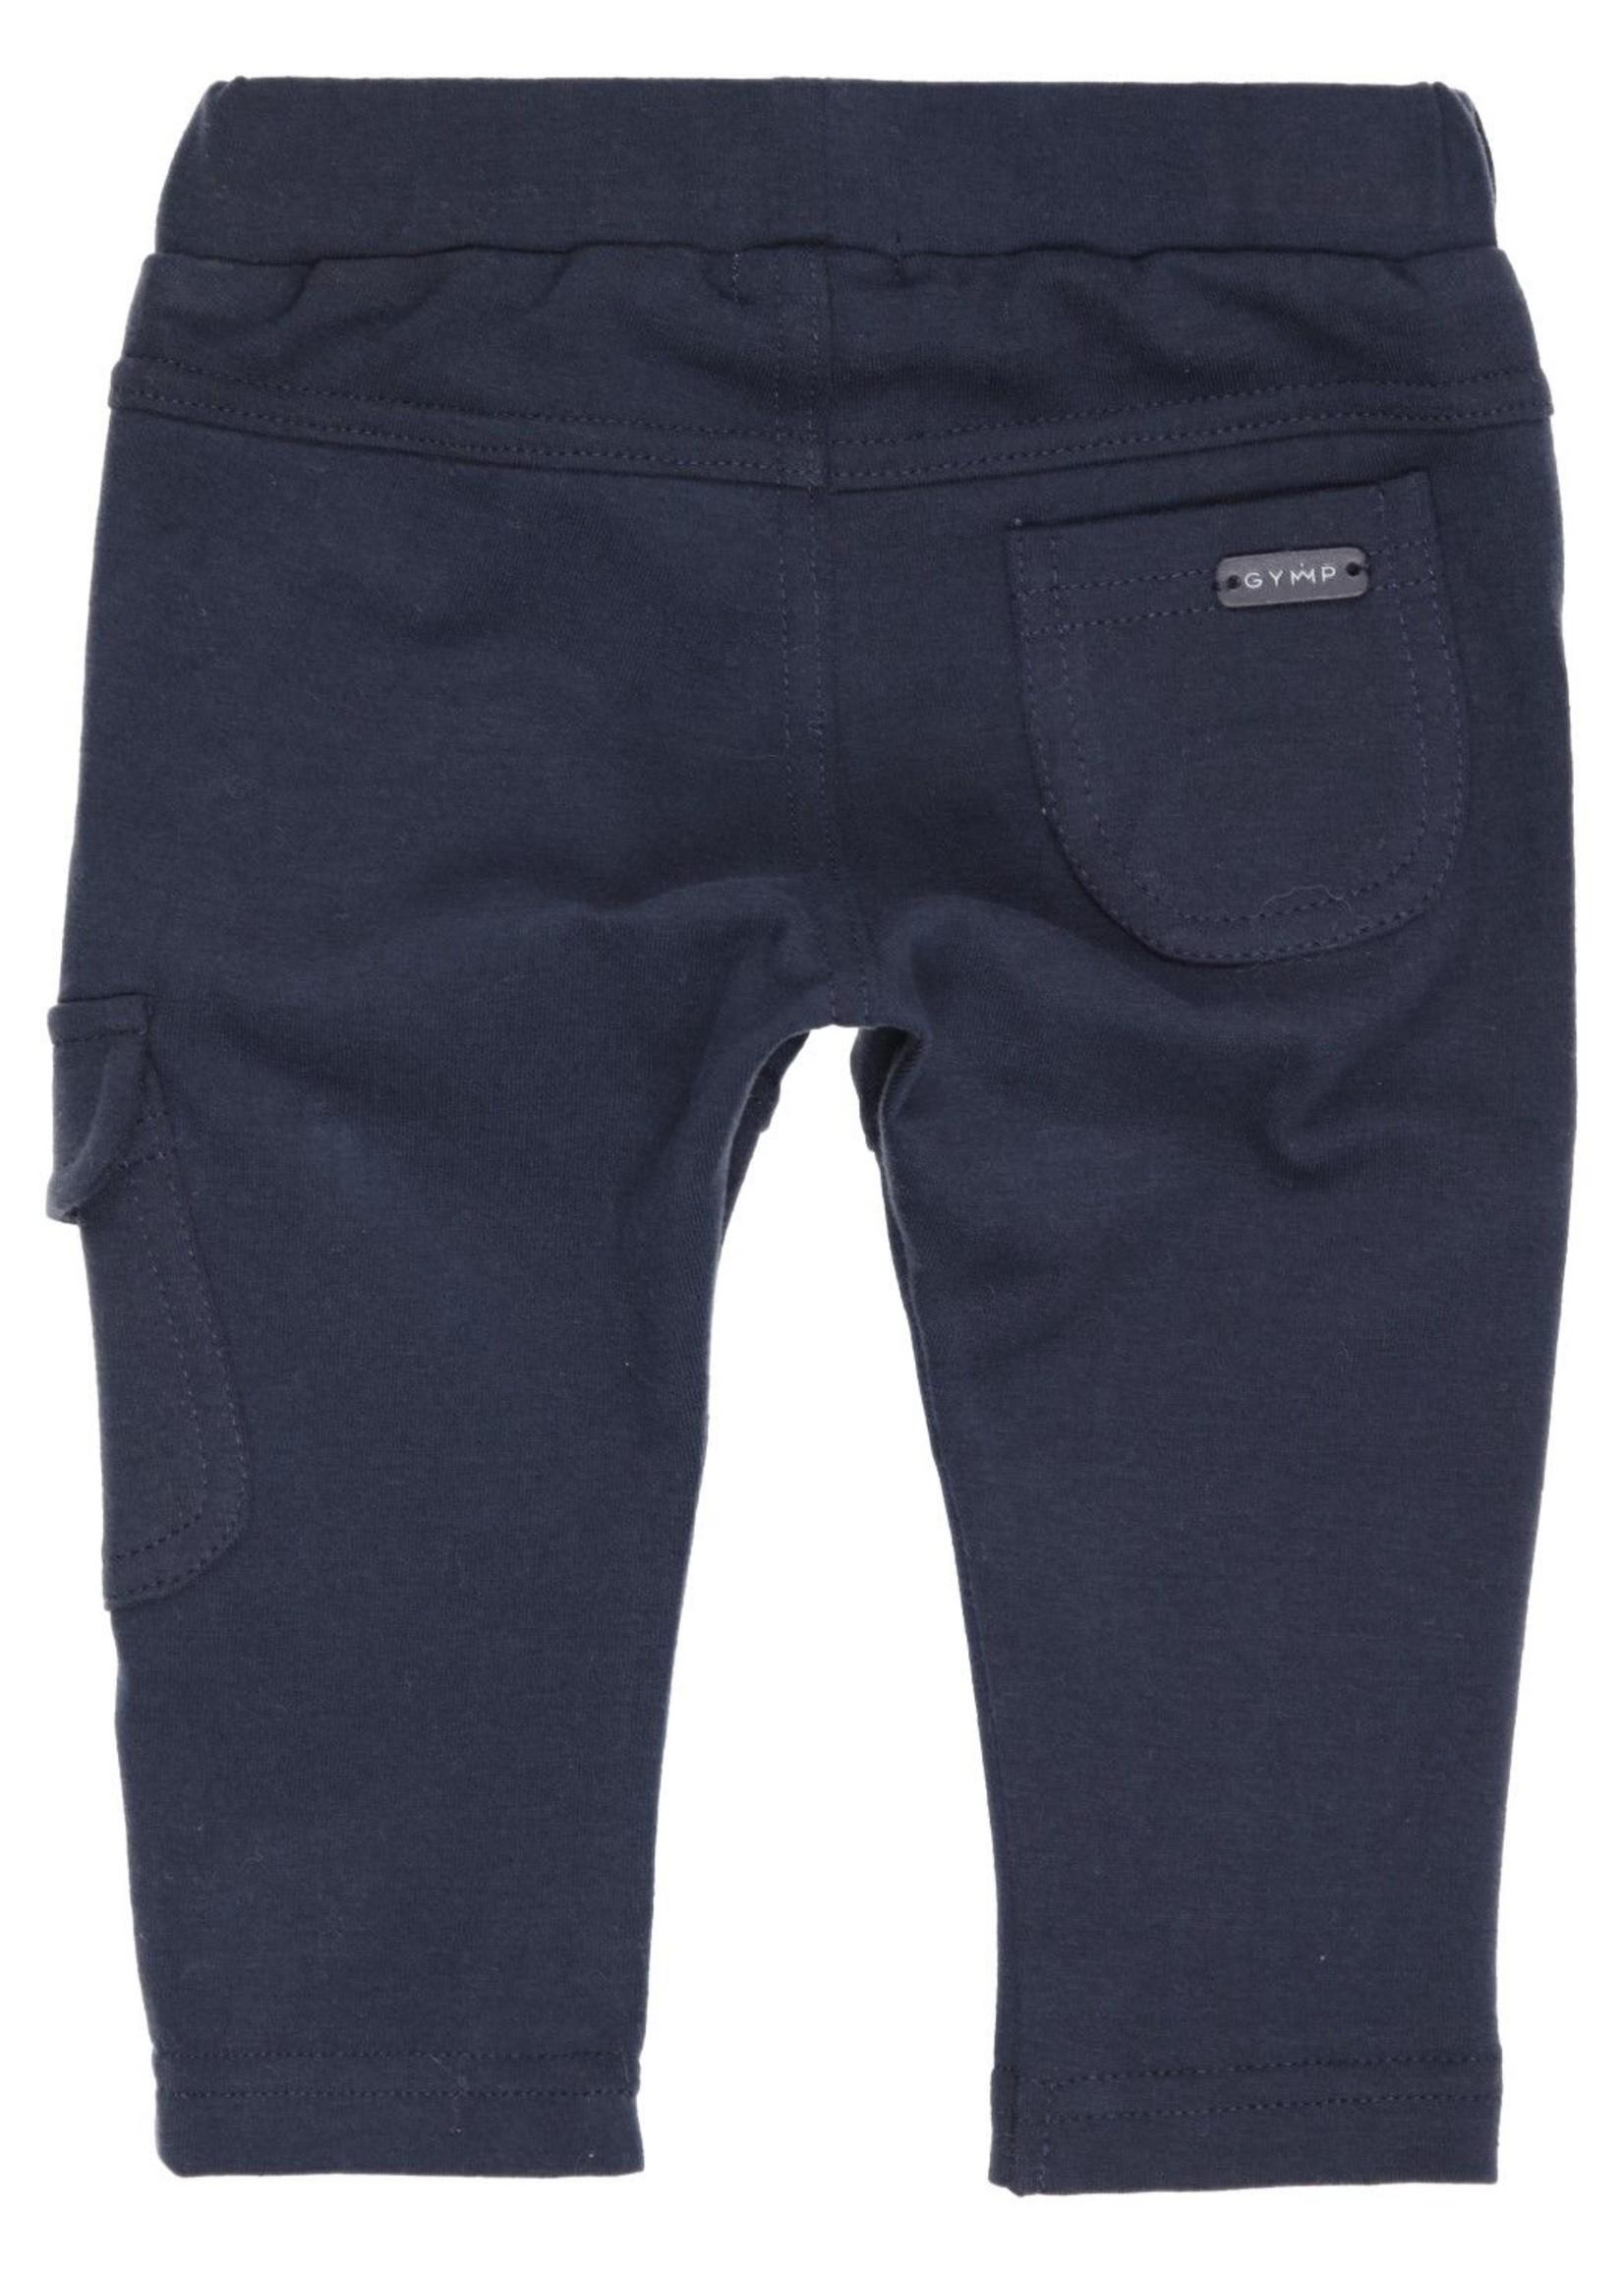 Gymp Gymp pants side pocket marine